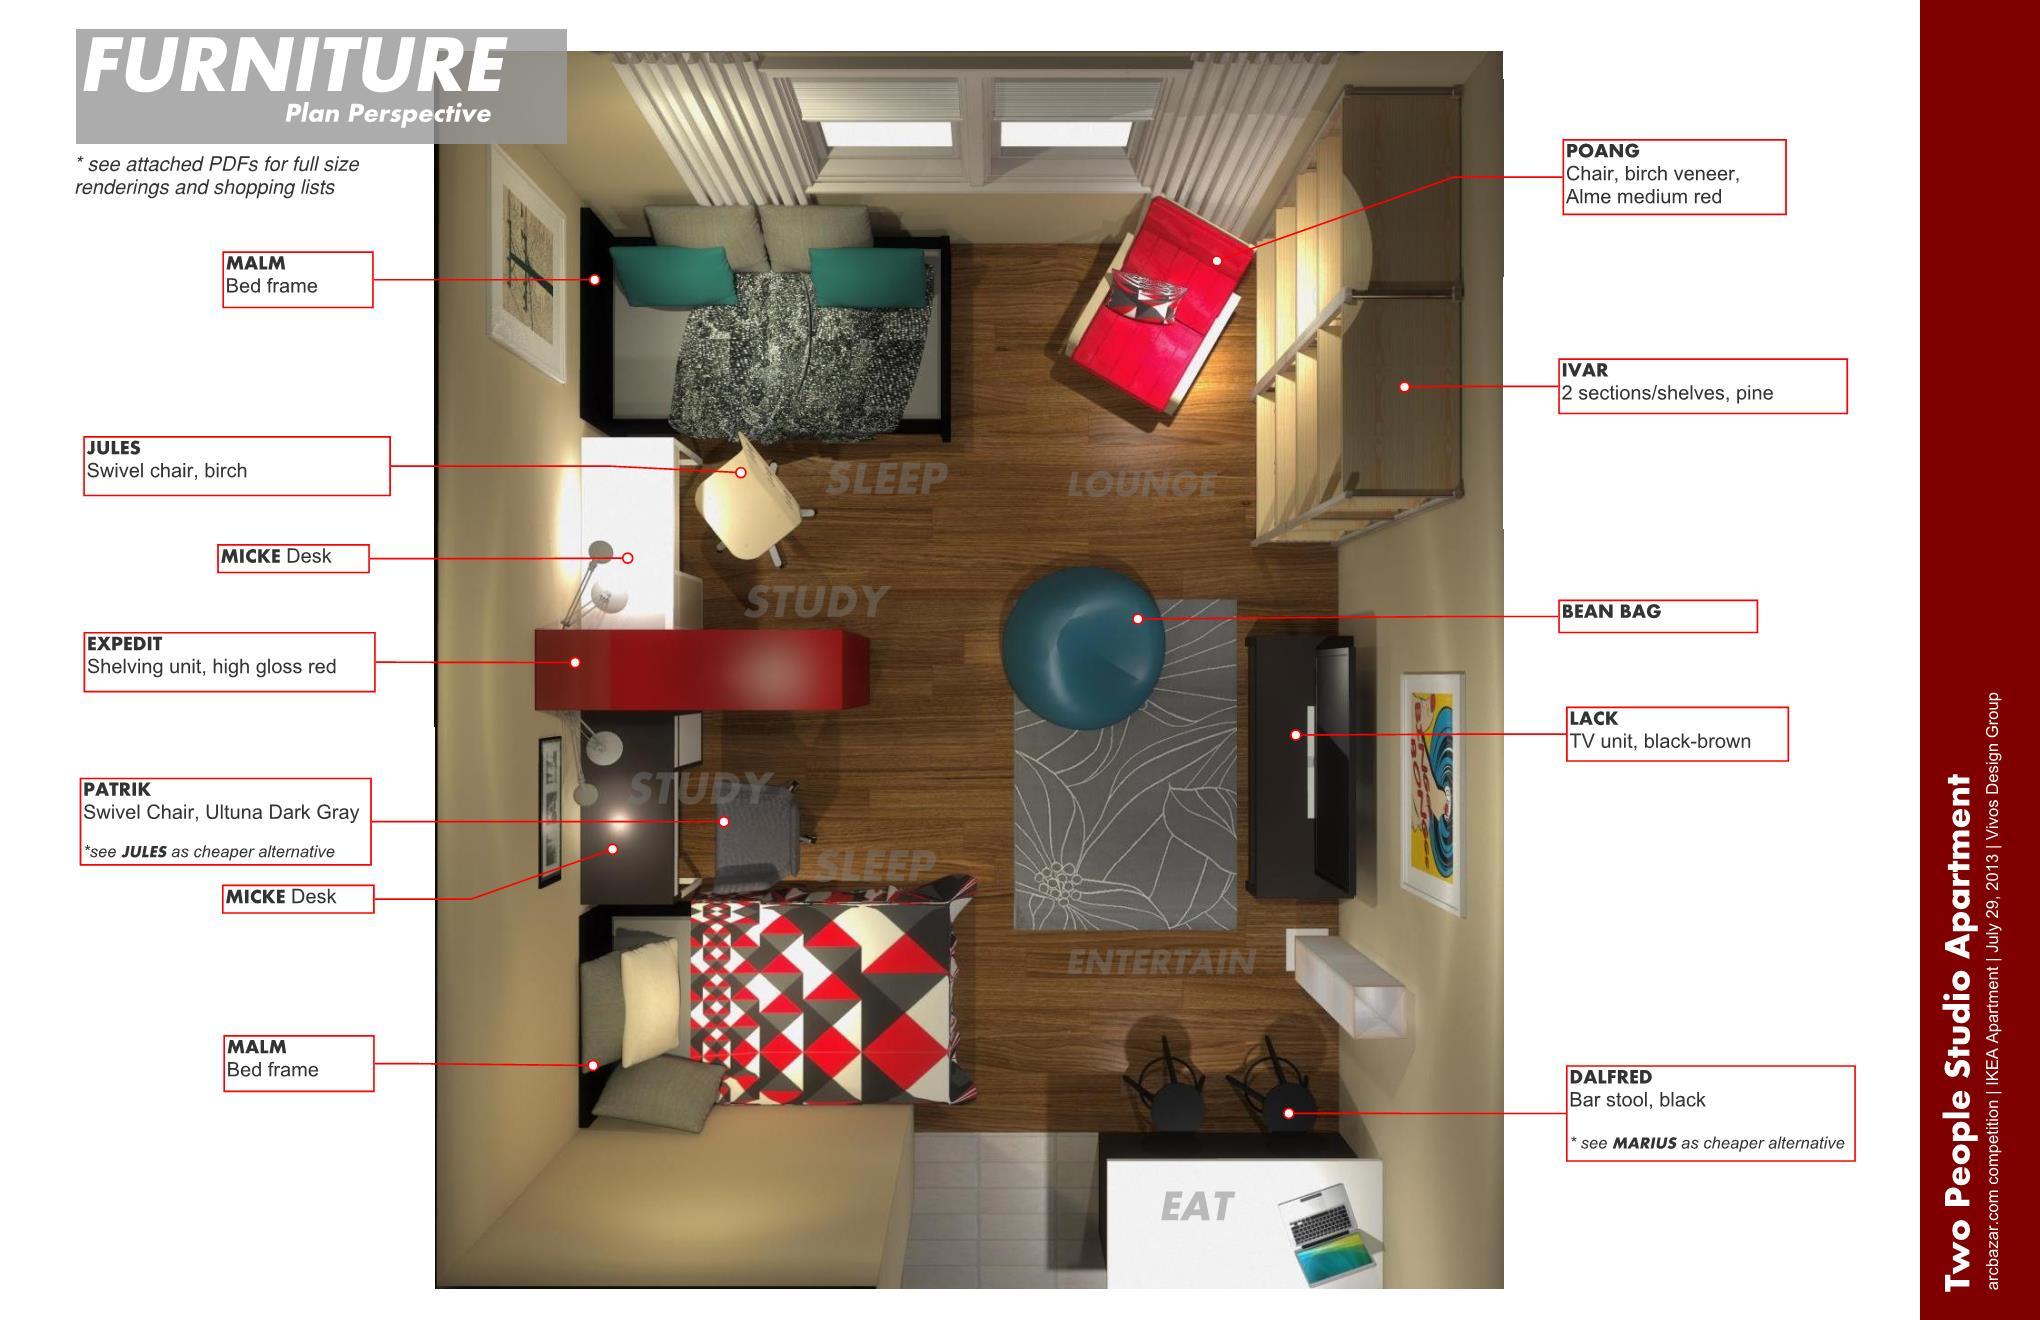 apartment design designed by vivos design group ikea apartment skillman us arcbazar. Black Bedroom Furniture Sets. Home Design Ideas